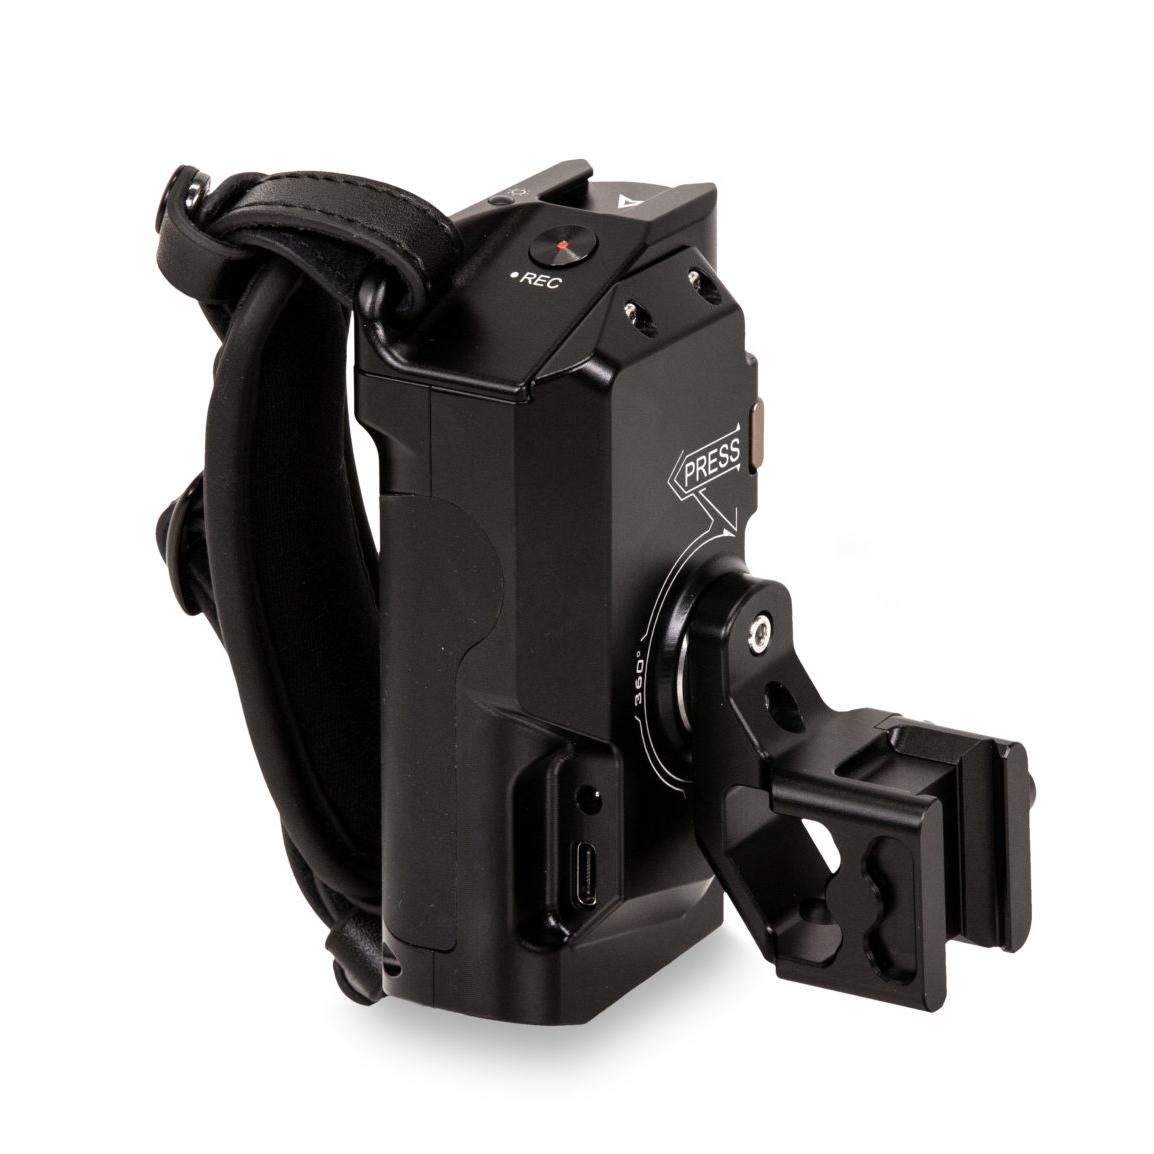 tilta-TA-LRH6-57-B-left-side-advanced-run-stop-handle-r%C4%85czka-steruj%C4%85ca-02.jpg